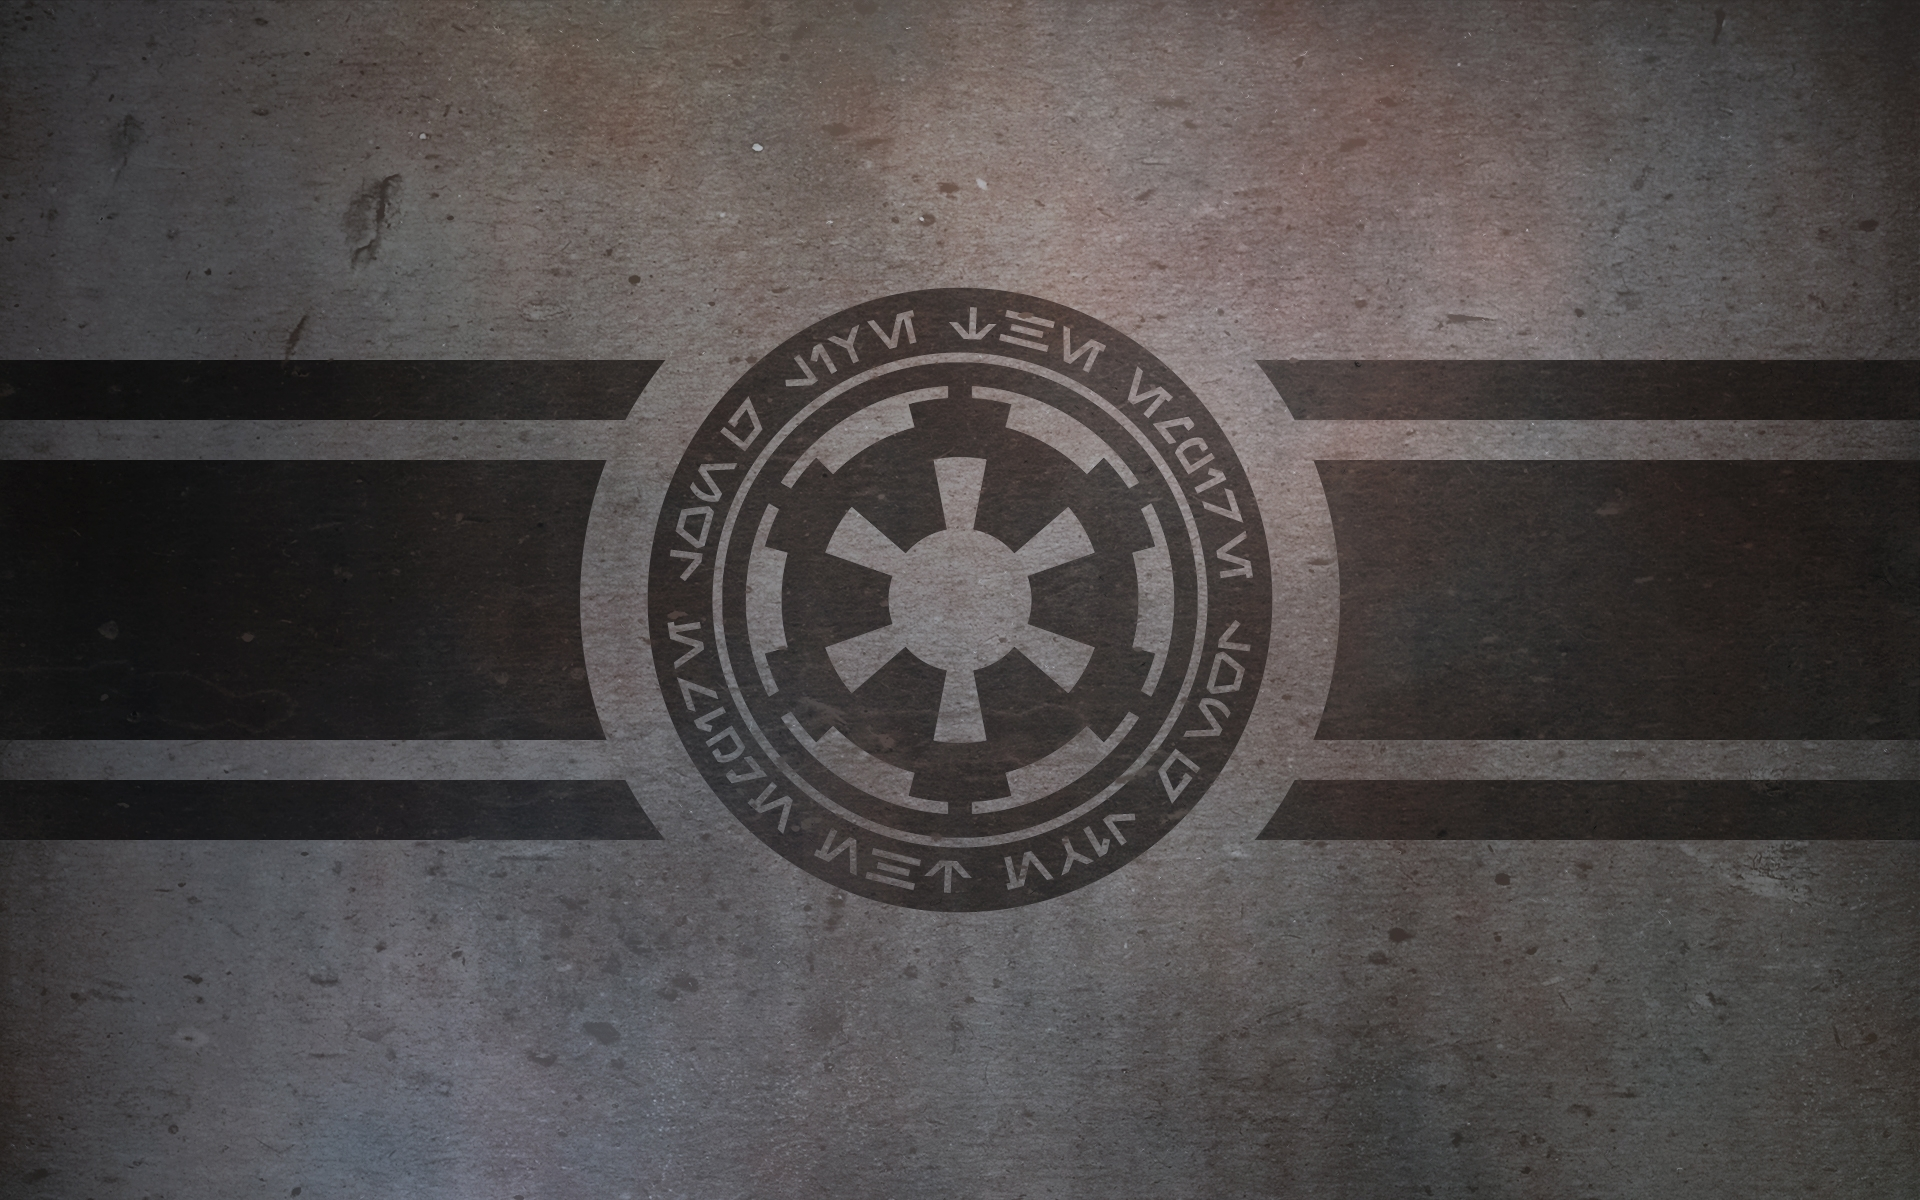 imperial empire insignia full hd fond d'écran and arrière-plan